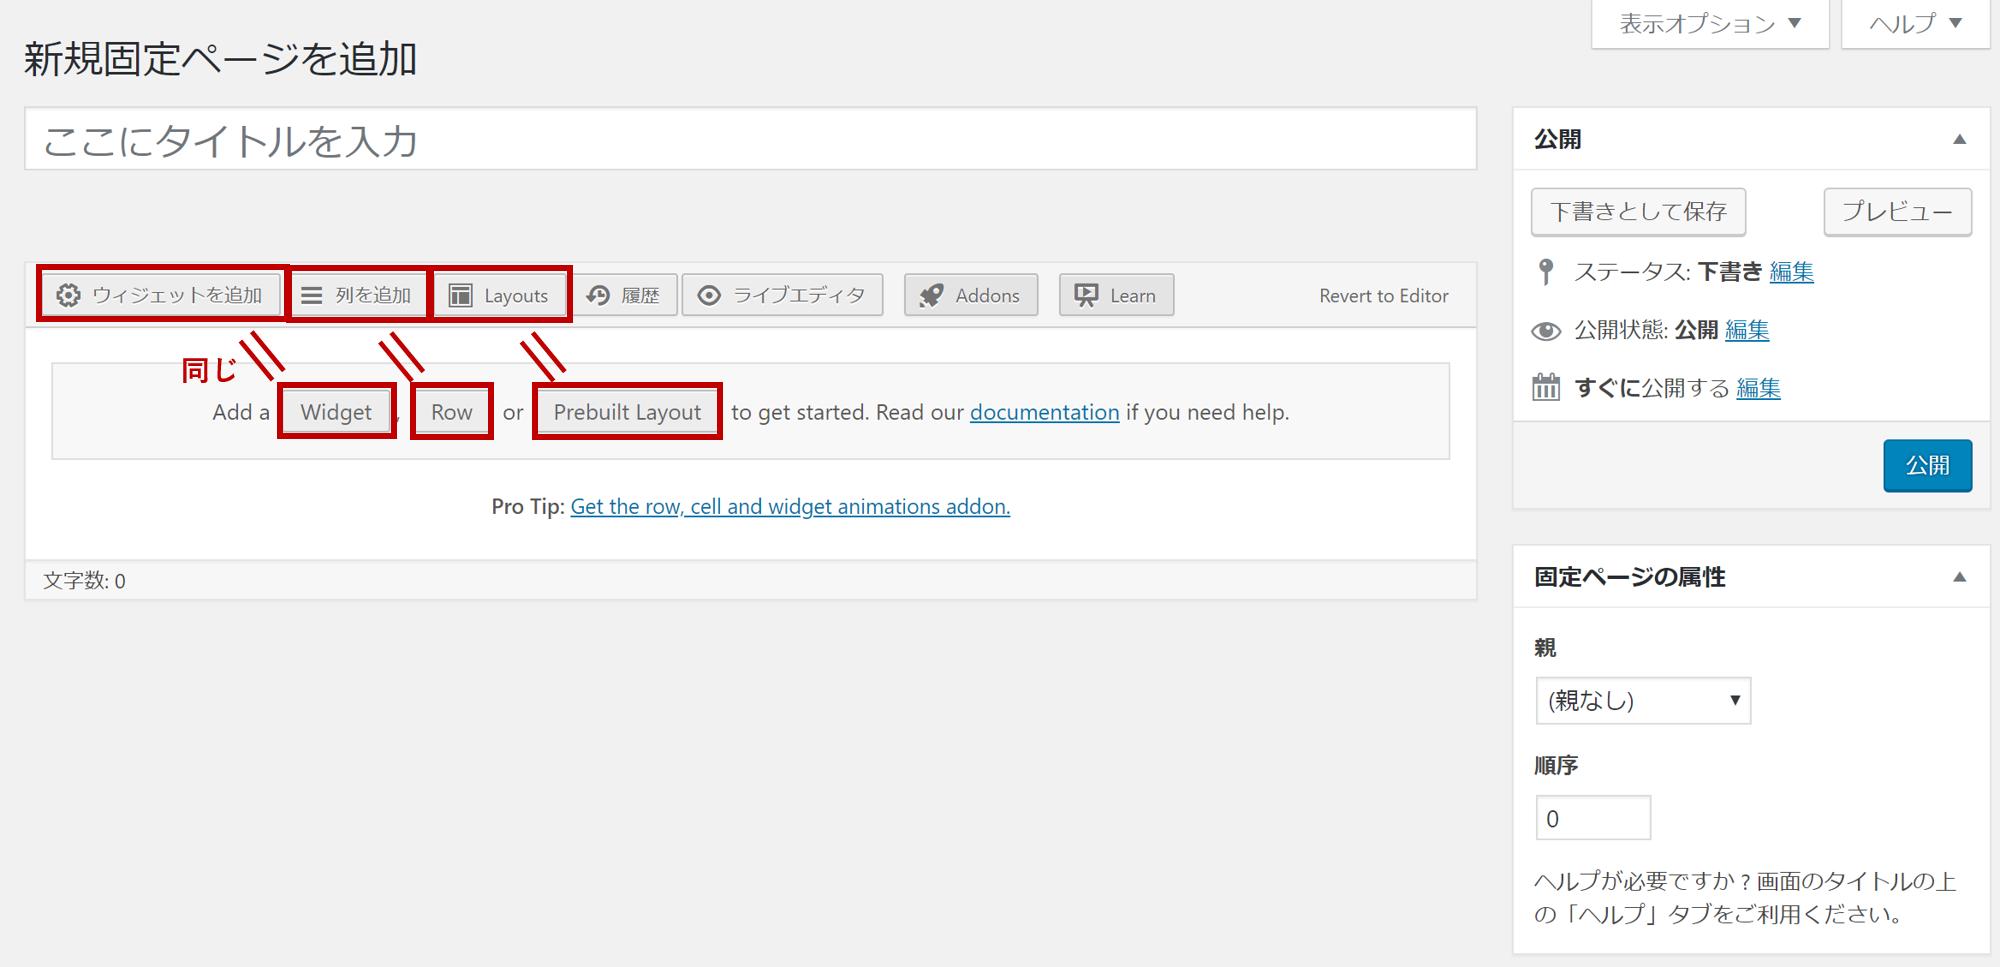 SiteOrigin画面のレイアウトを補足